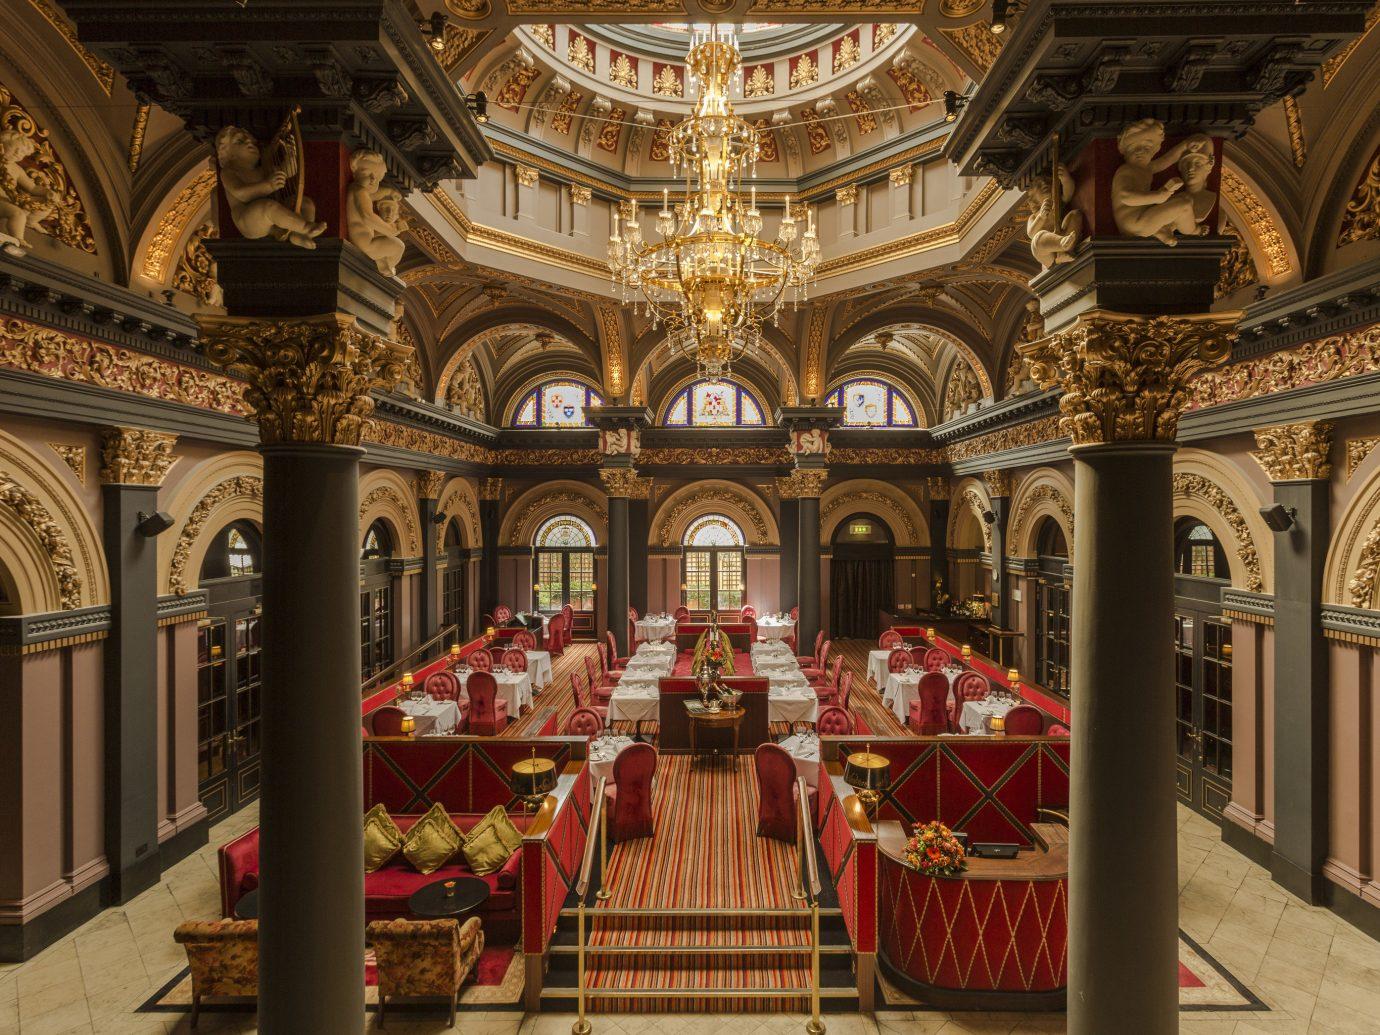 Hotels Trip Ideas building palace place of worship basilica chapel Church ballroom synagogue shrine altar